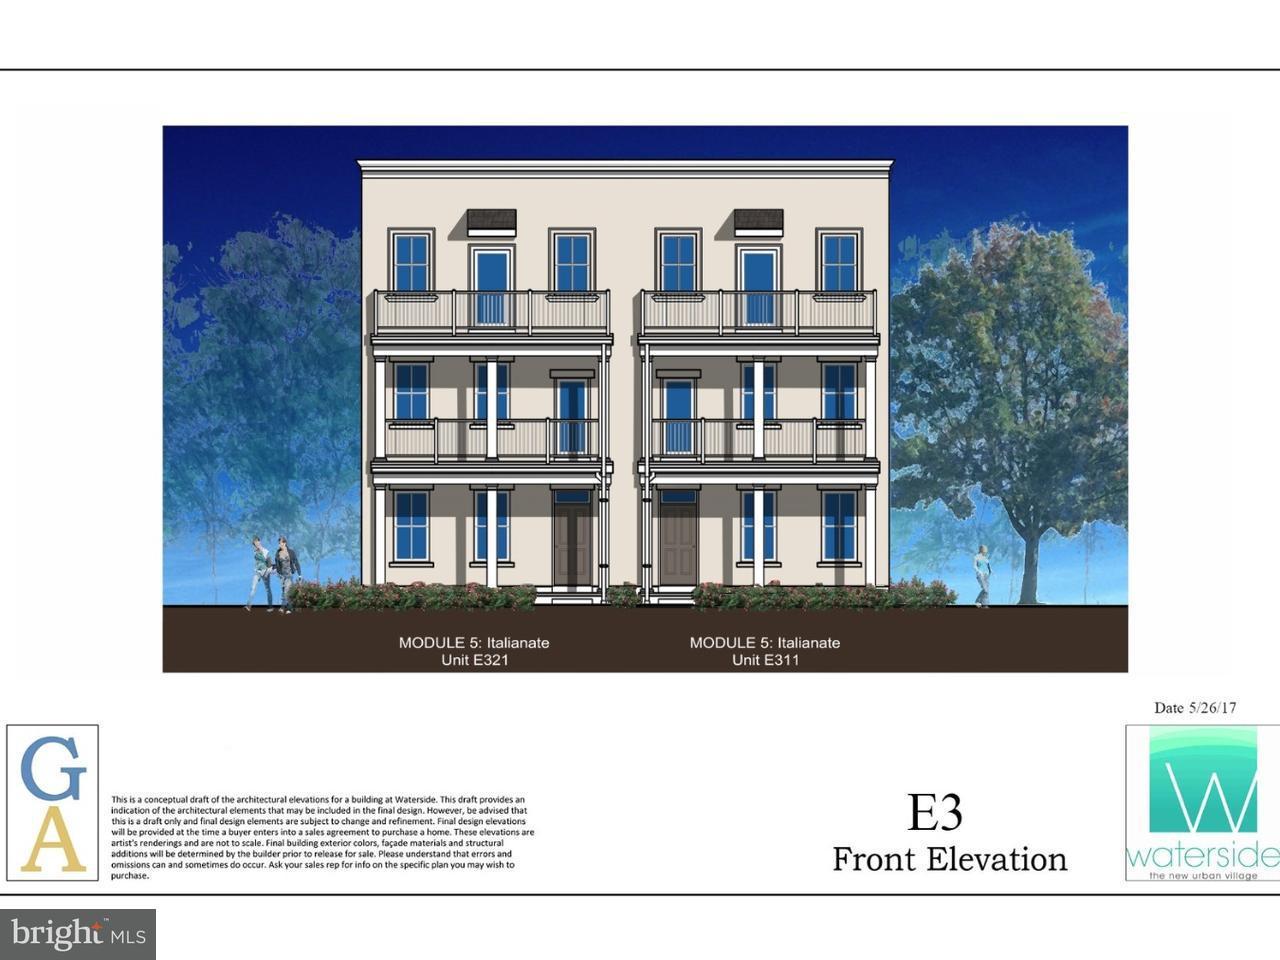 Townhouse for Sale at E311 DOCK ST #E311 Bensalem, Pennsylvania 19020 United States